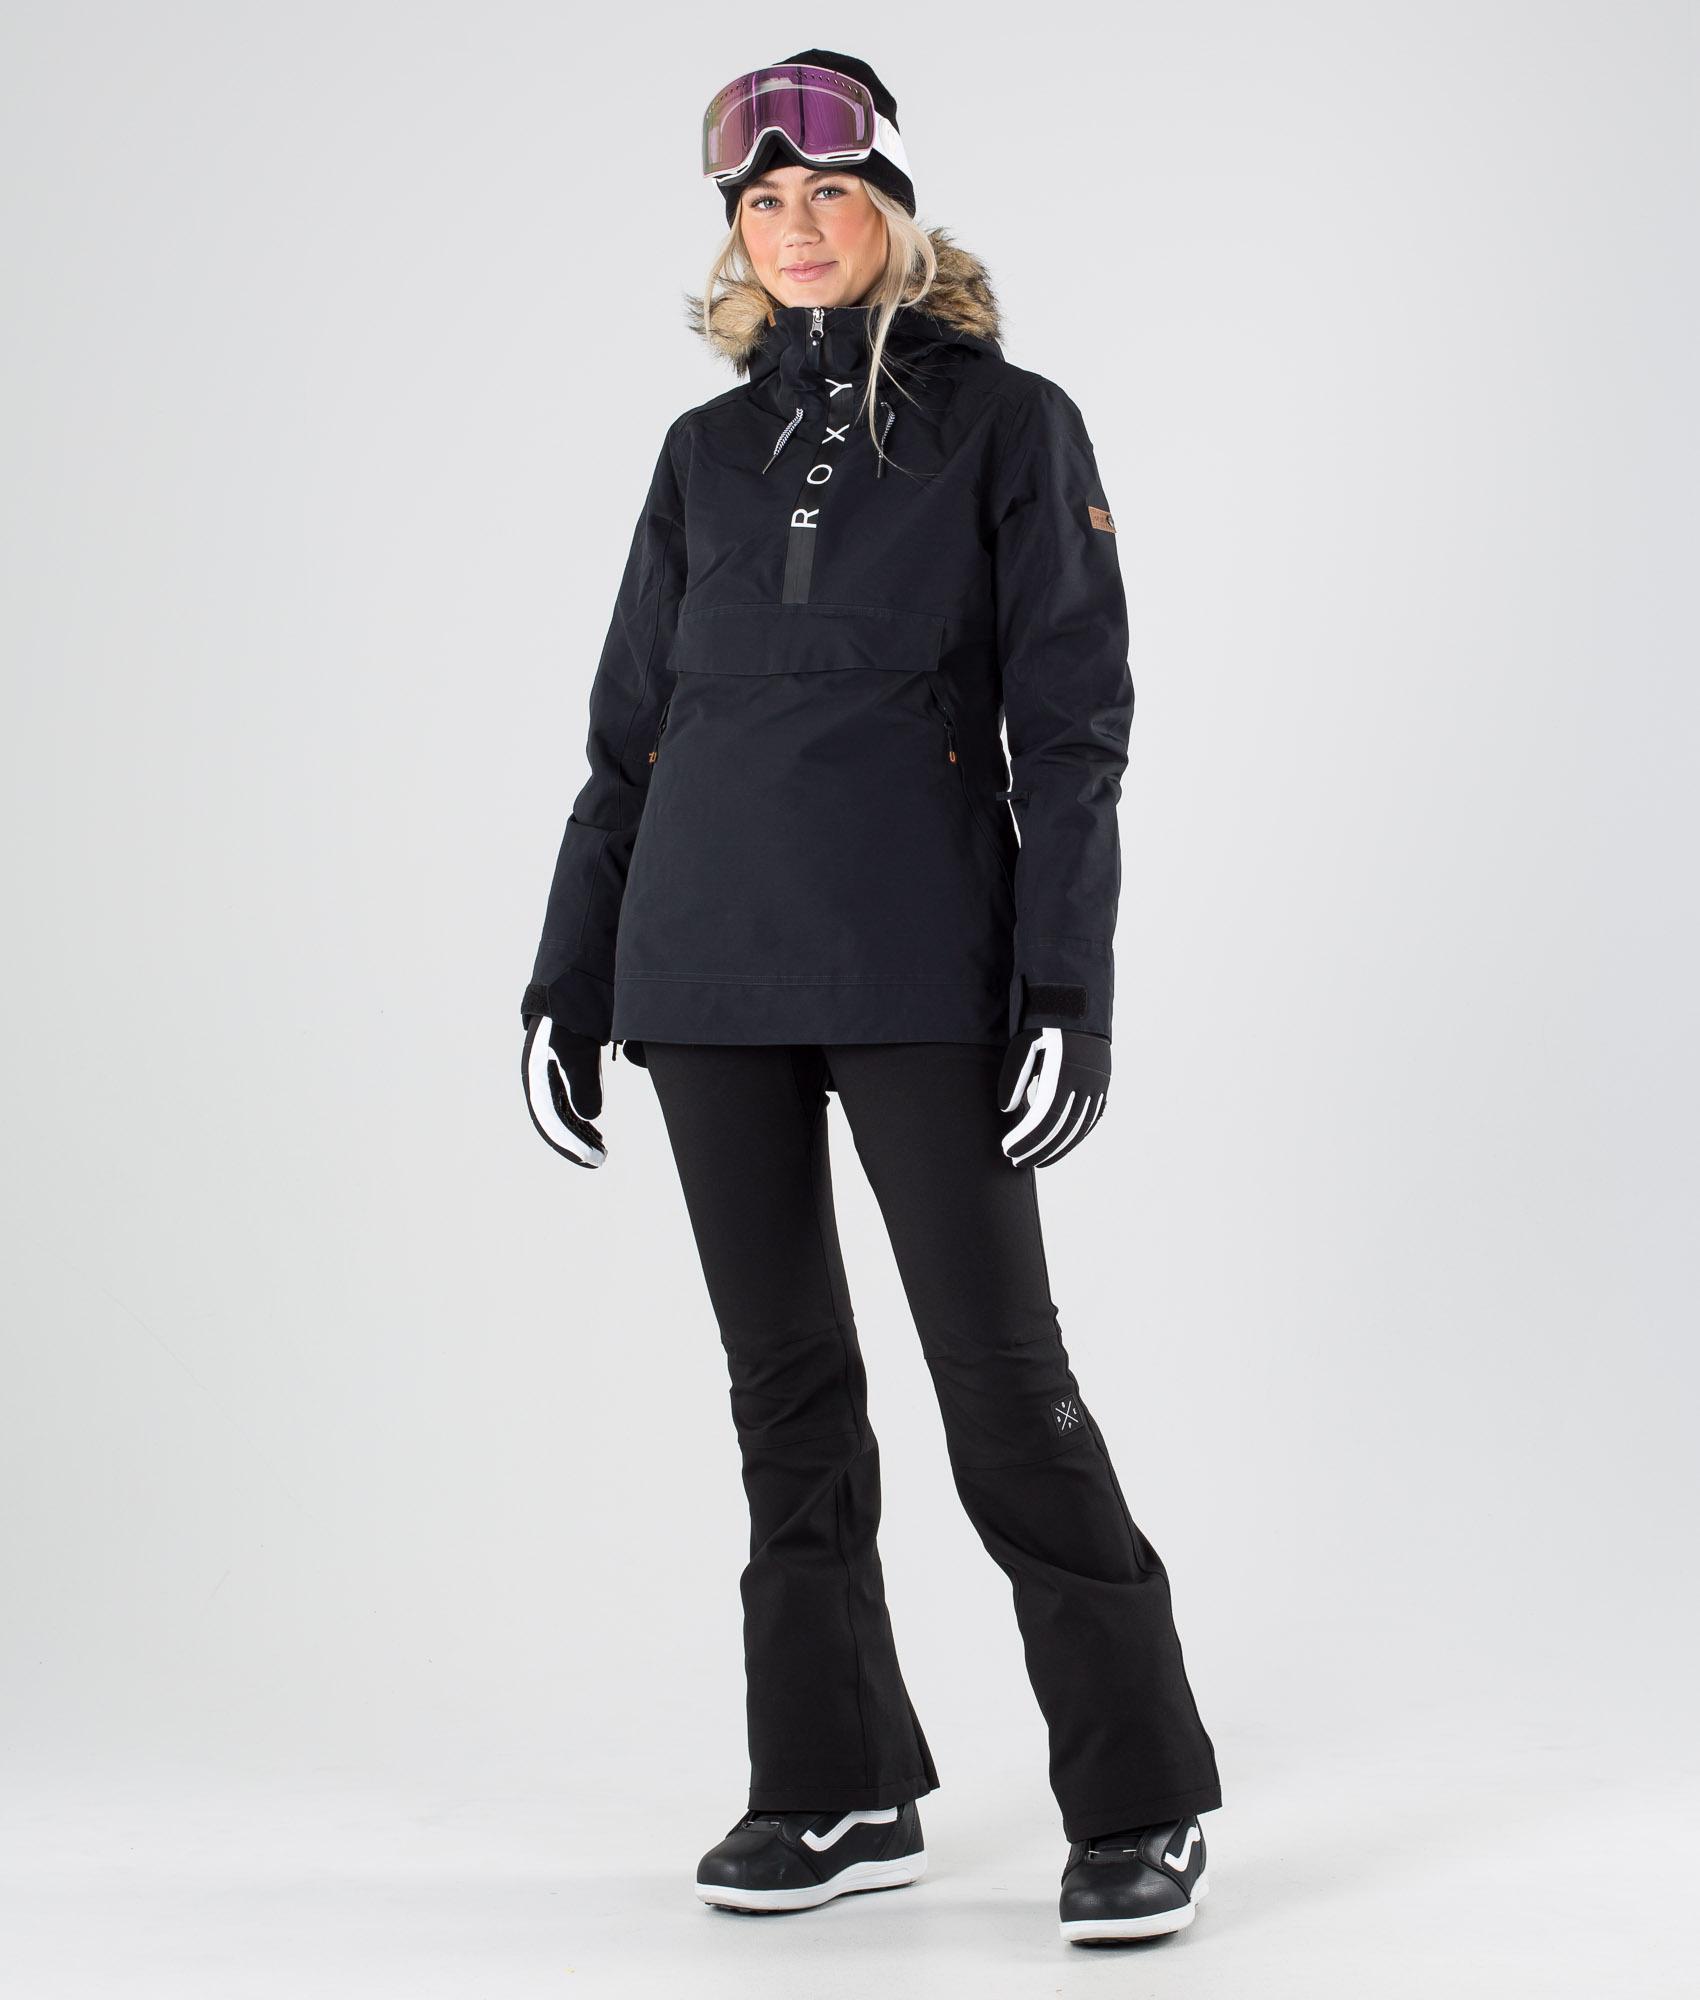 Roxy Shelter Snowboardjakke True Black Ridestore.no